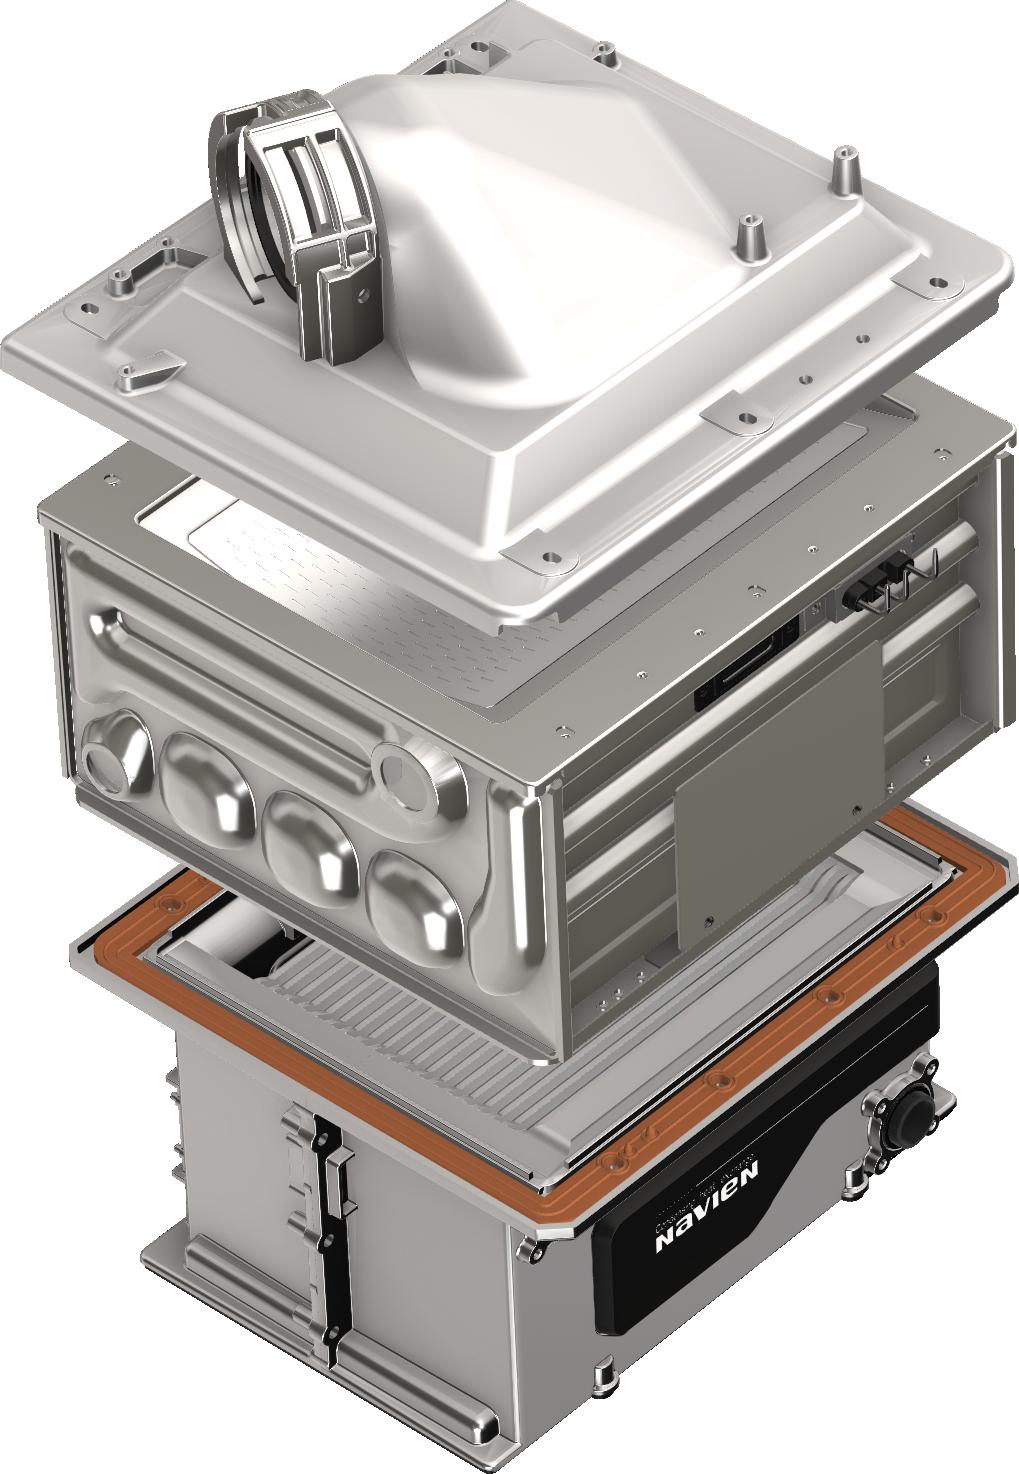 Heatexchanger-3d-ncb-h